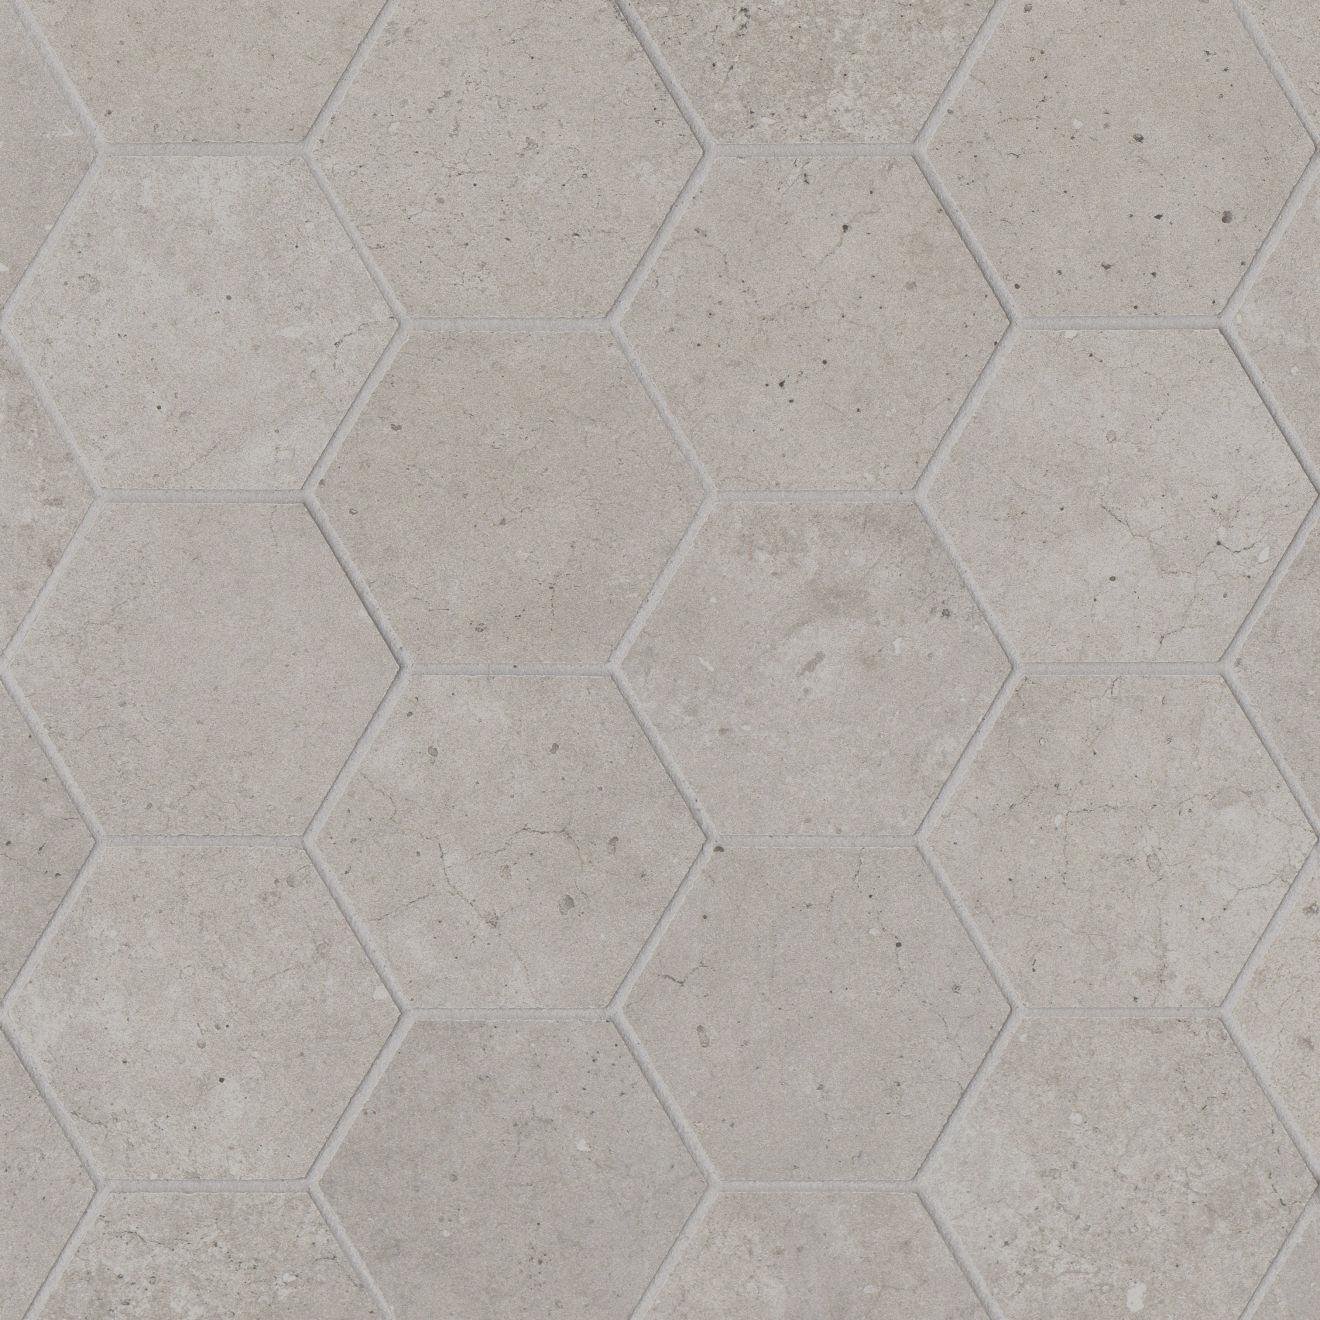 "Materika 3"" Hexagon Matte Porcelain Mosaic in Silver"